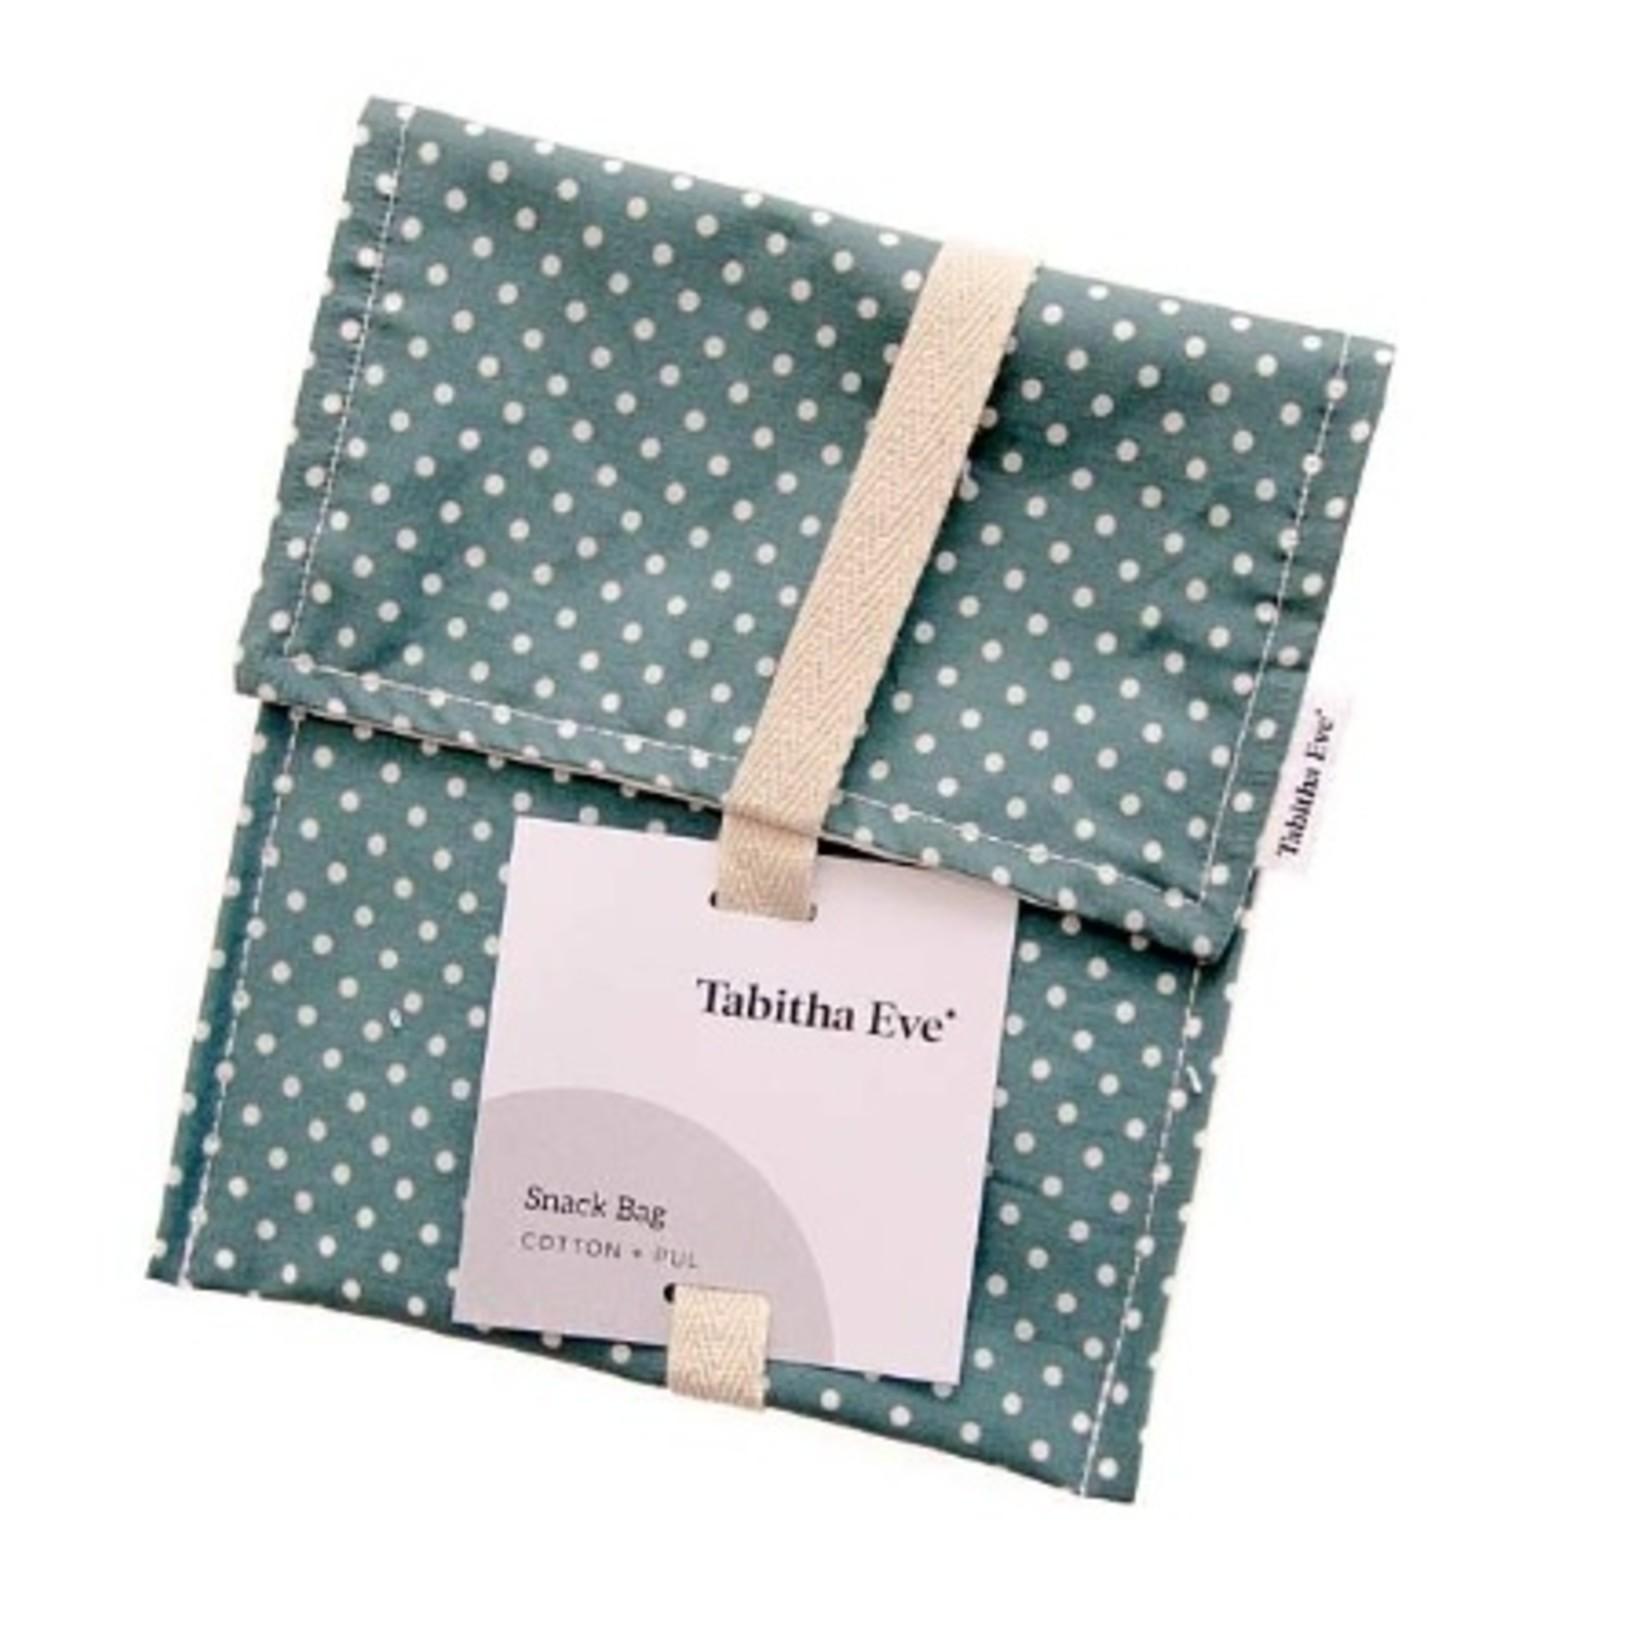 Tabitha Eve Snack Bag